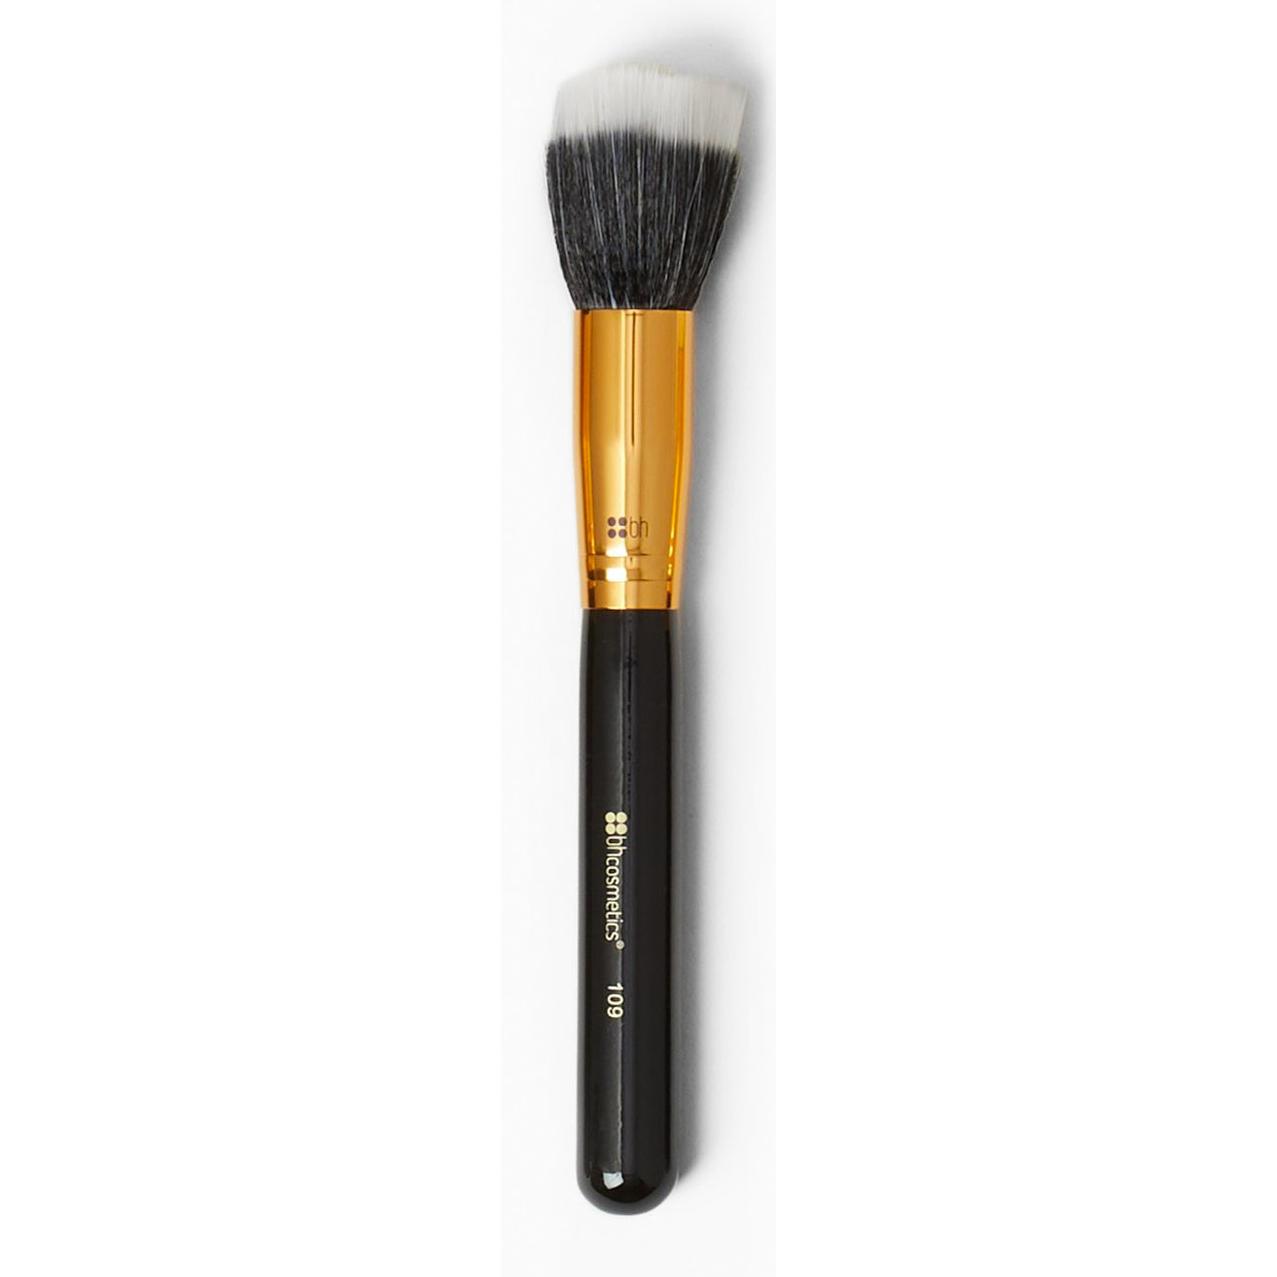 BH Cosmetics Duo Fiber Brush 109